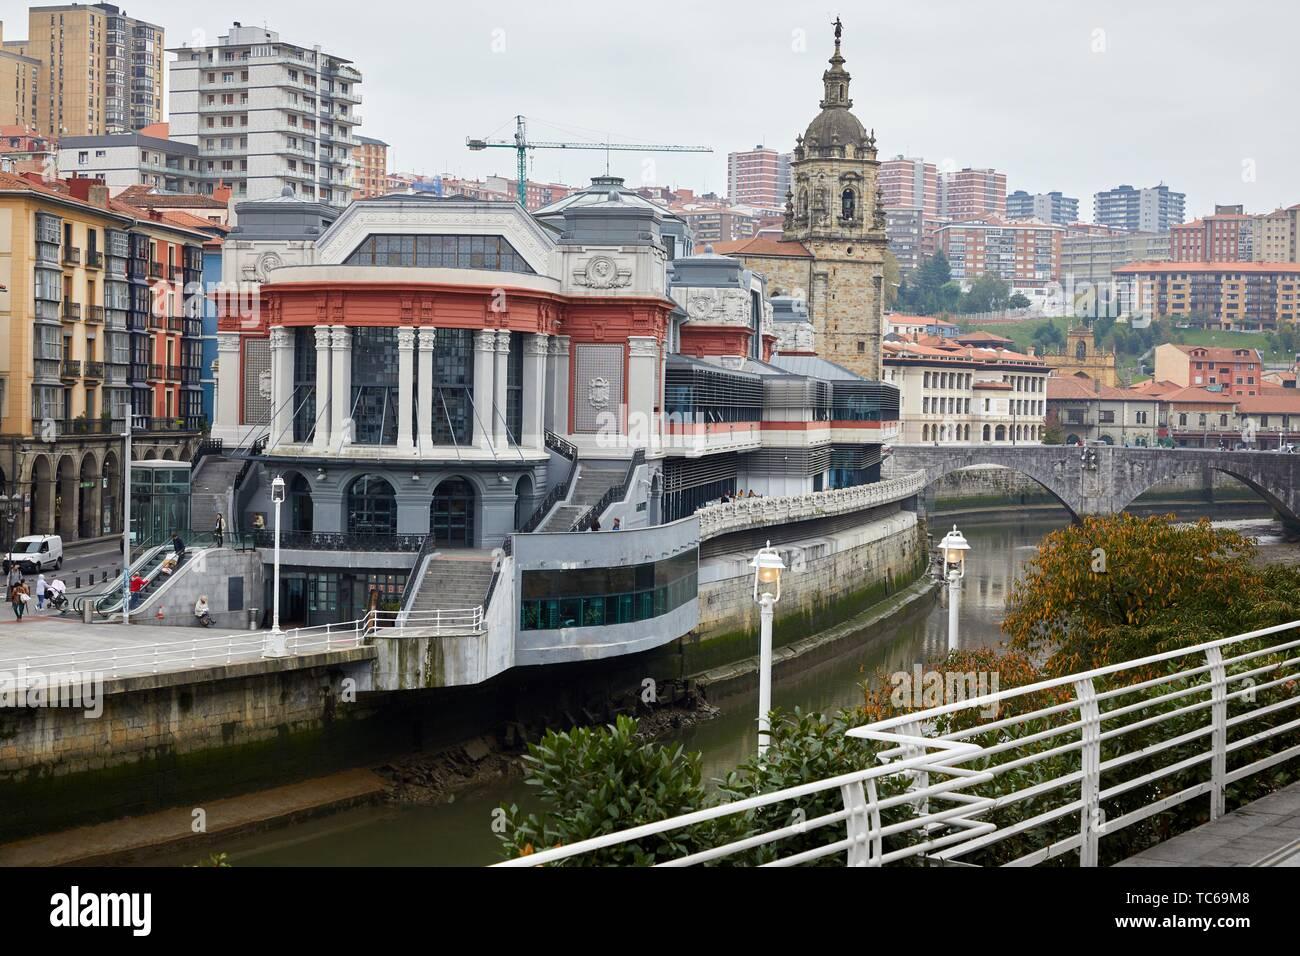 Nervion River, Mercado de la Ribera e Iglesia San Anton, Bilbao, Basque Country, Spain - Stock Image